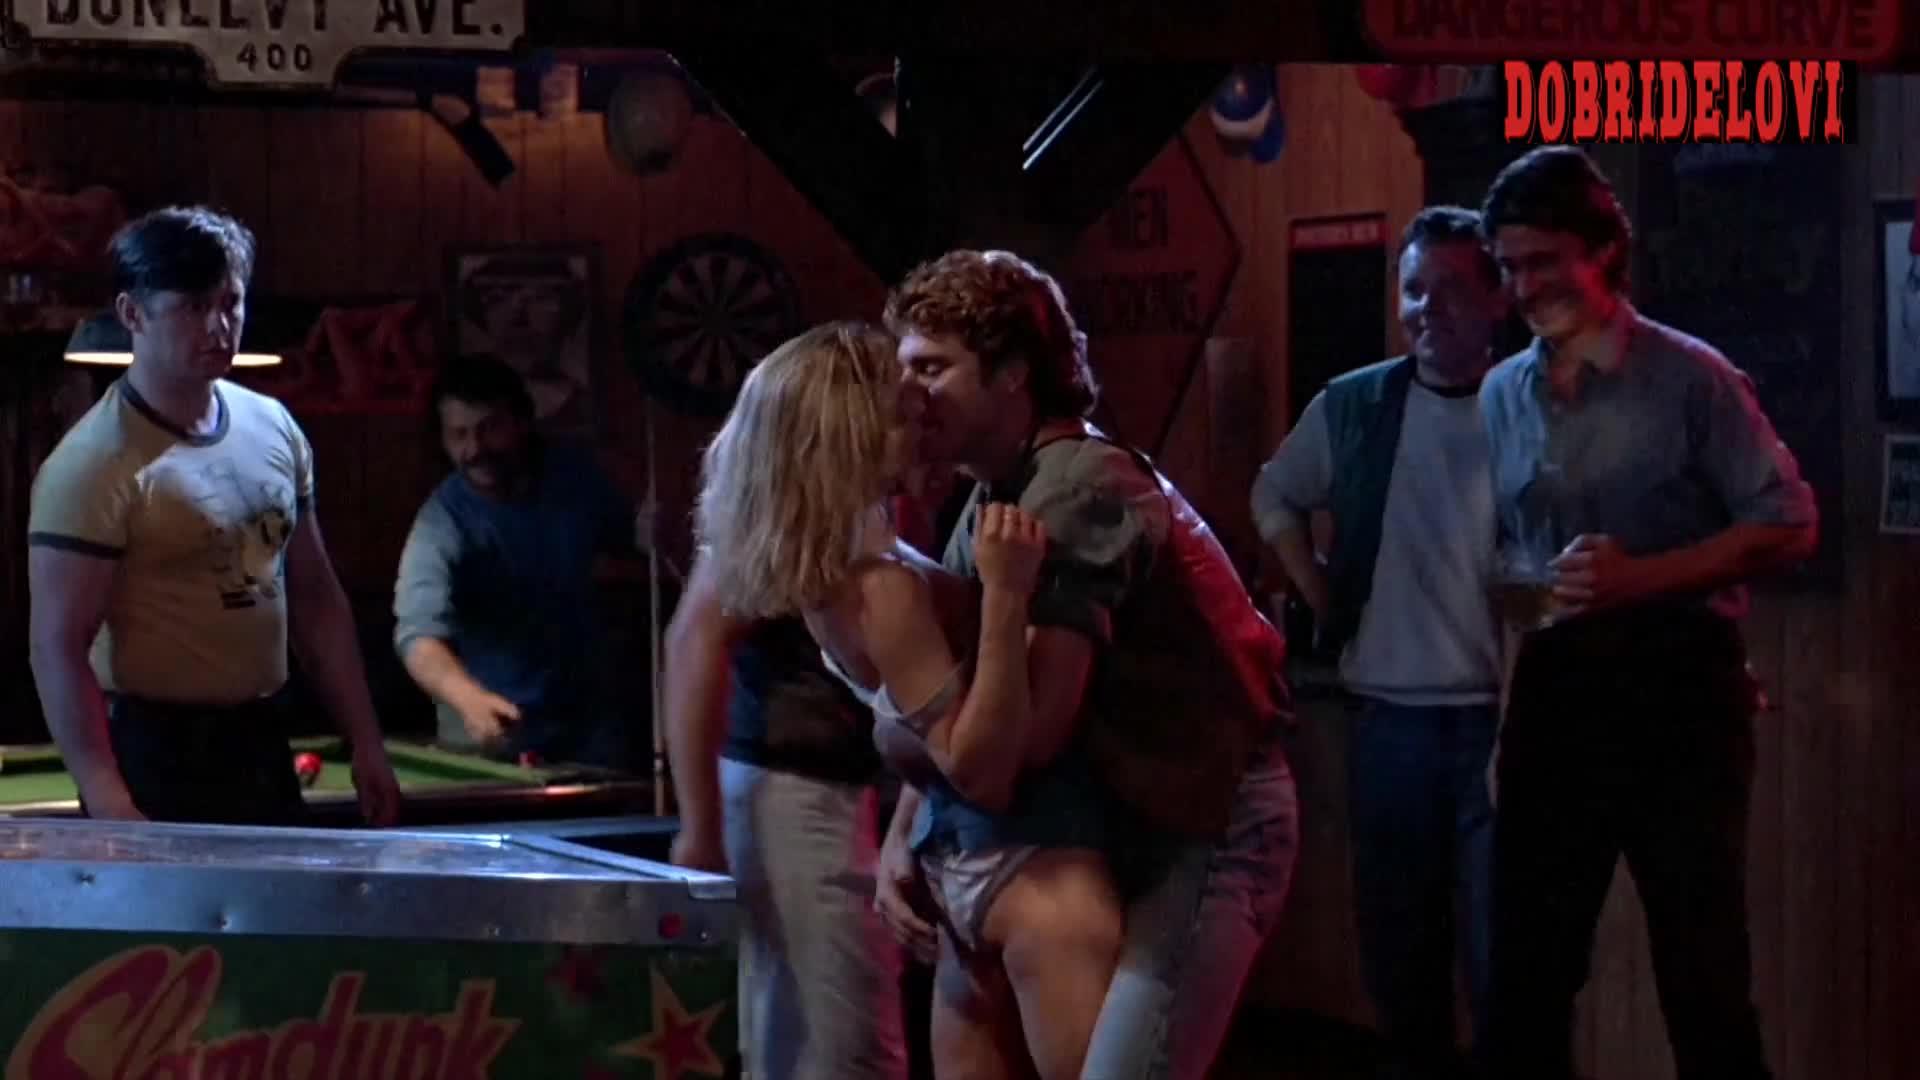 Jodie Foster pinball machine rape scene from The Accused